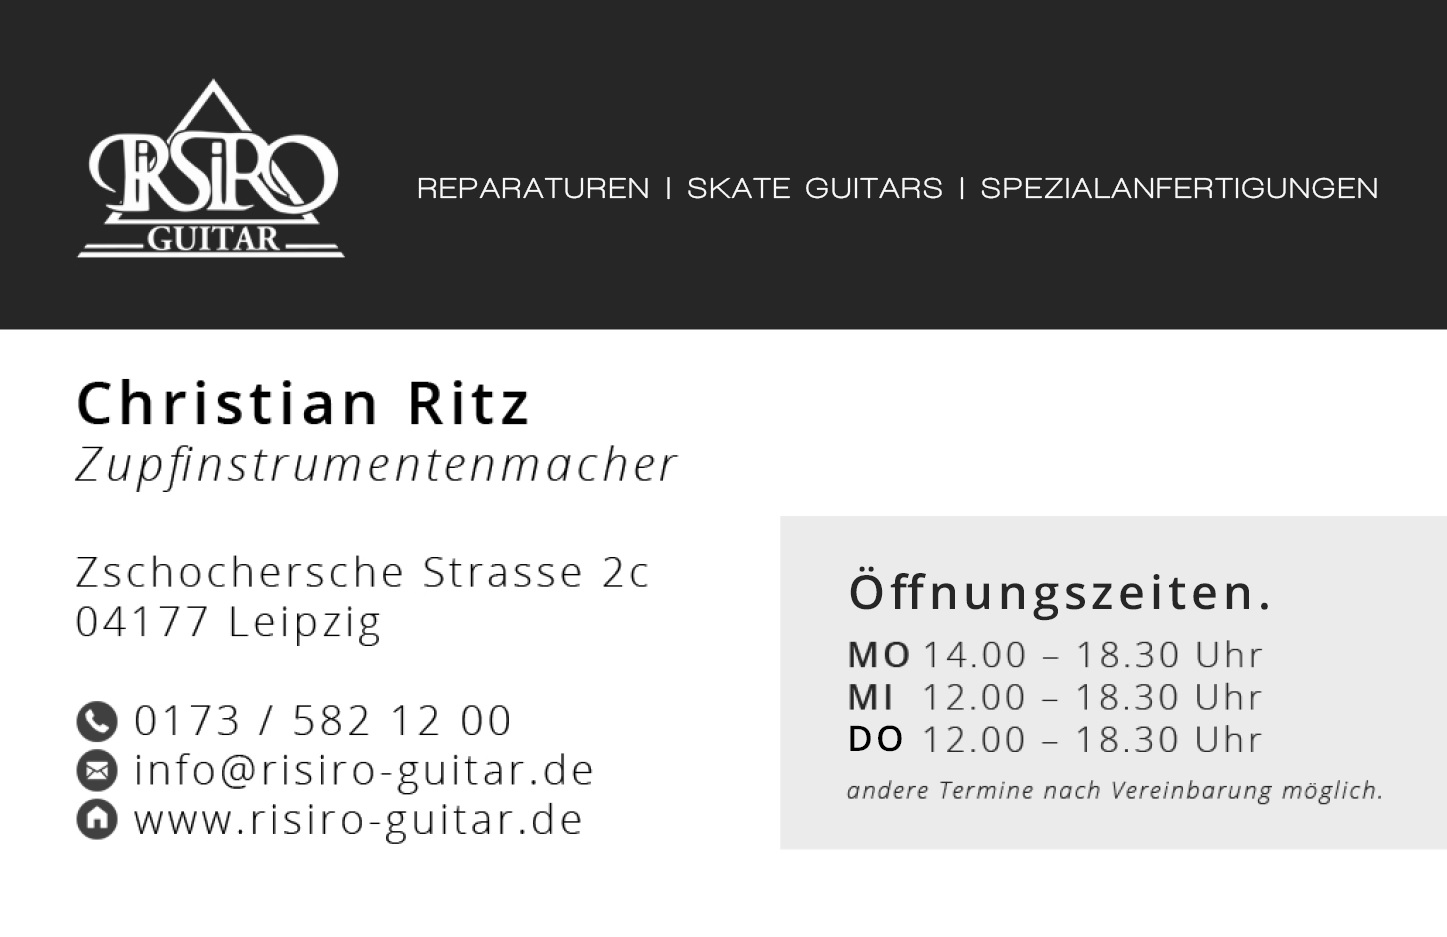 Christian Ritz - Zupfinstrumentenmac